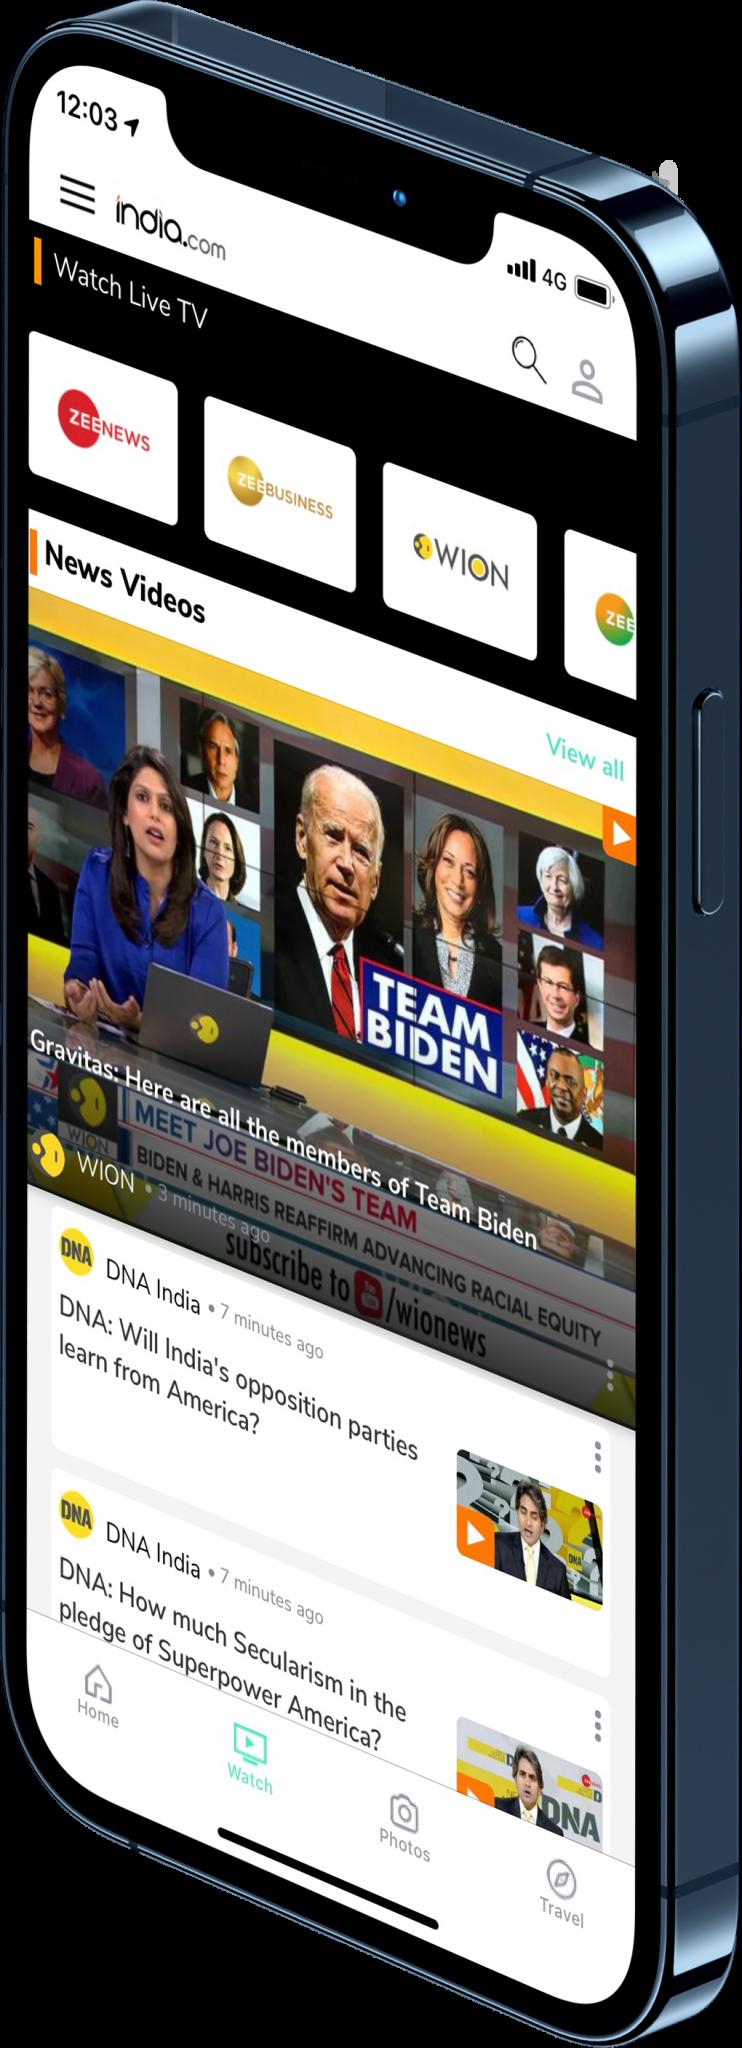 ecommerce platform with mobile app